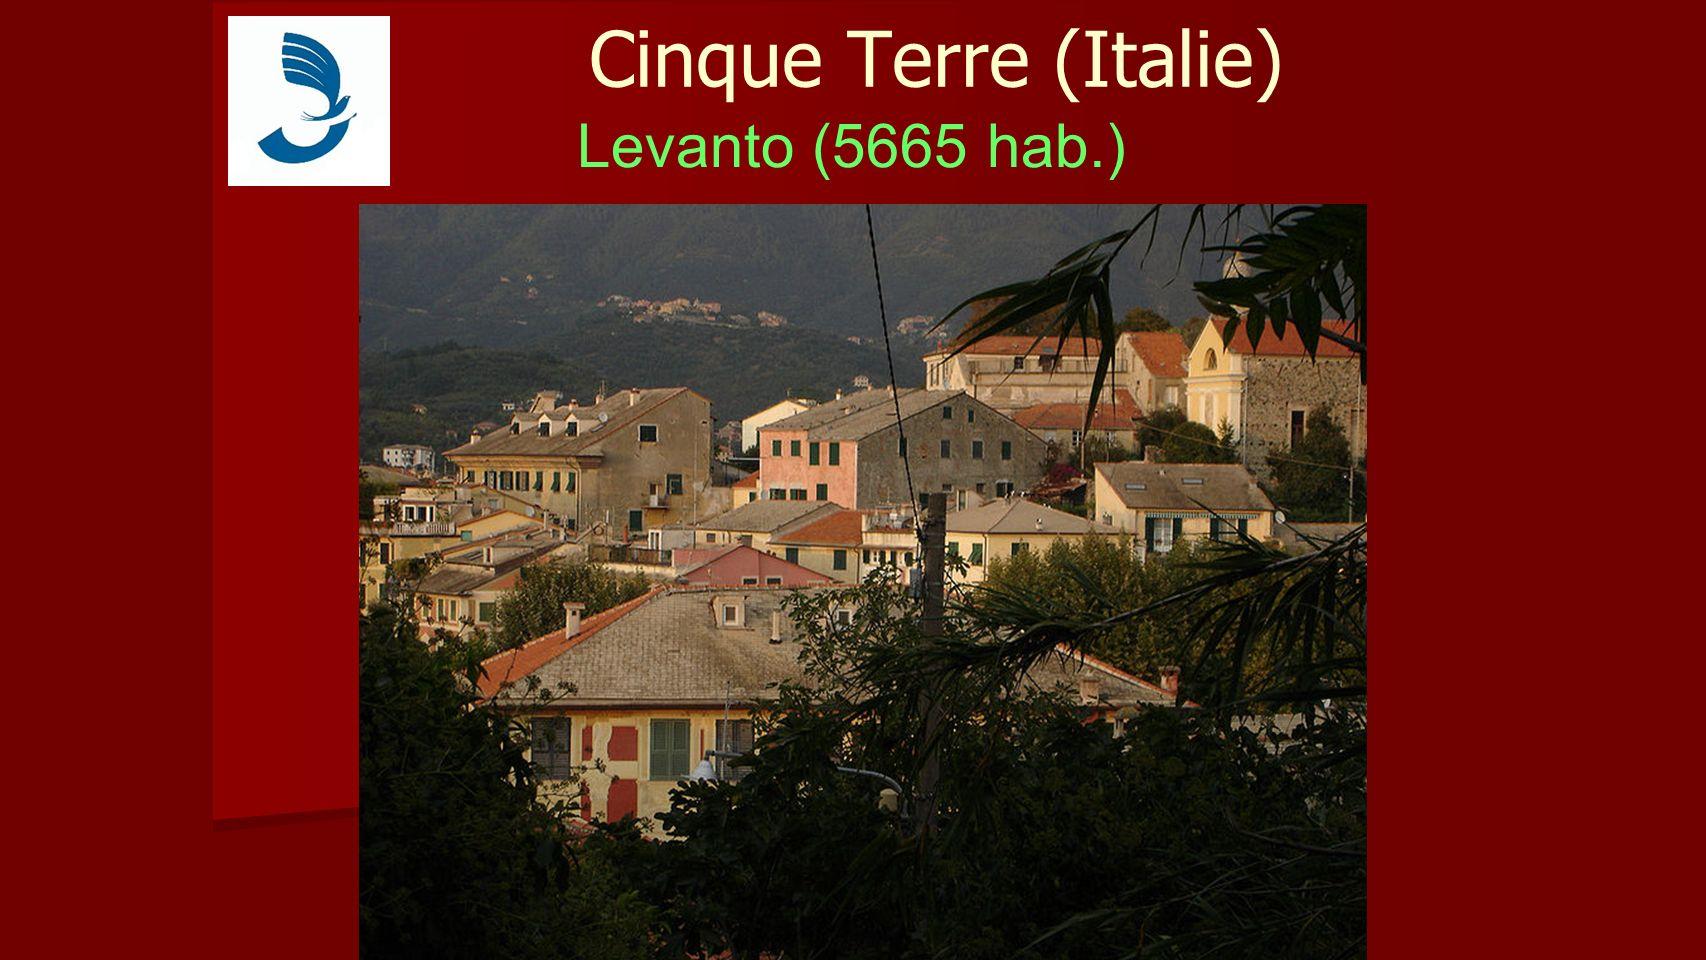 Cinque Terre (Italie) Levanto (5665 hab.)